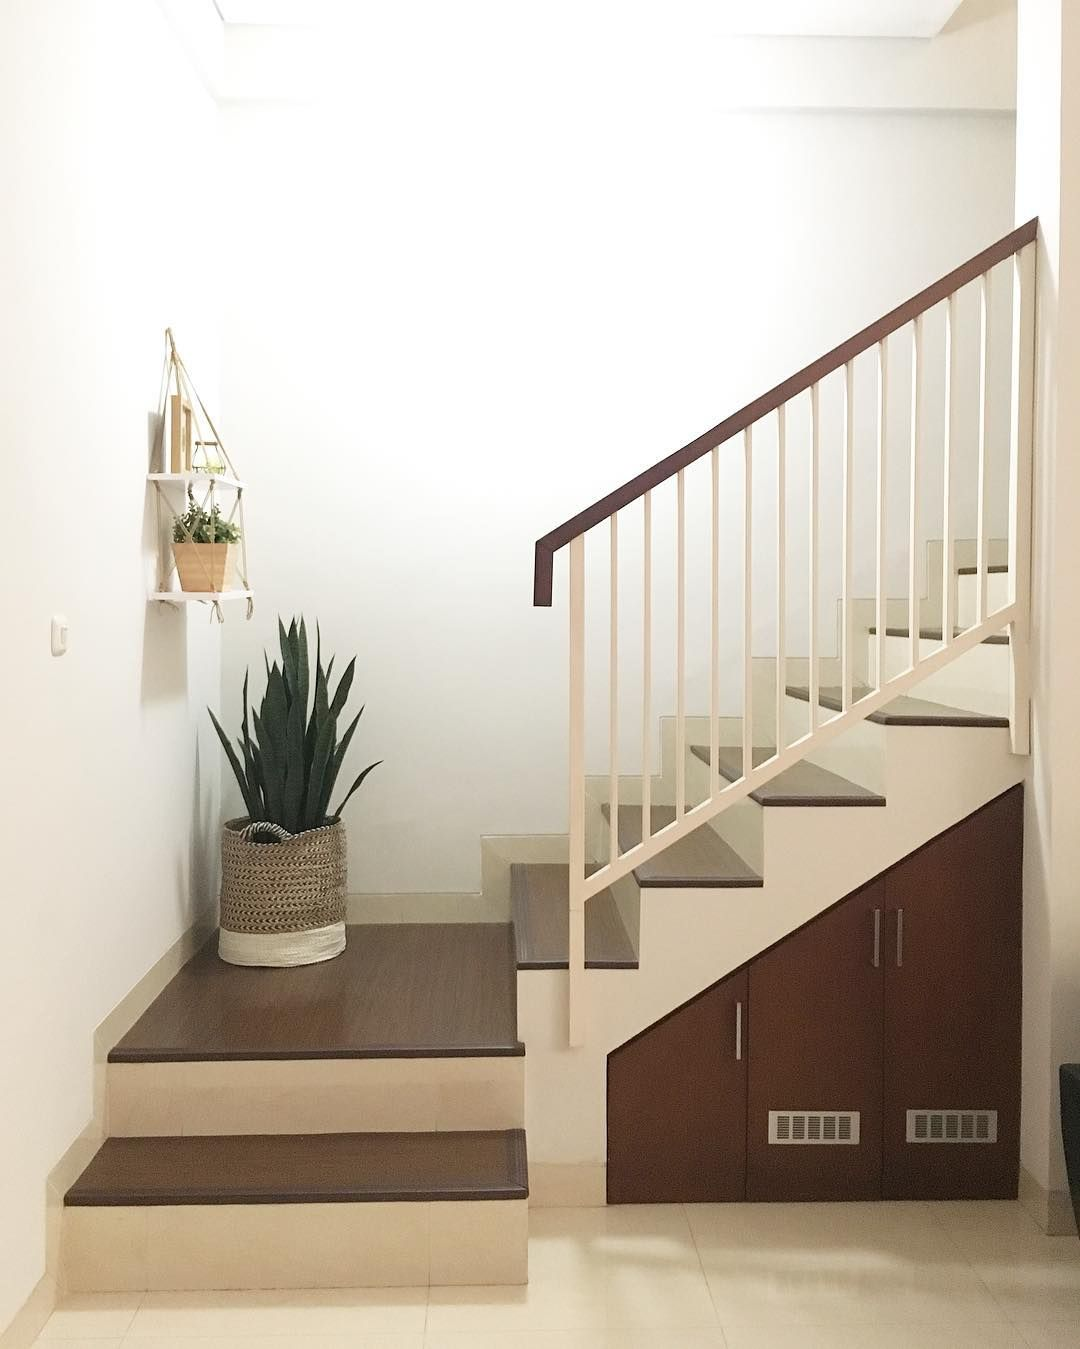 Tangga Beton Rumah Minimalis Staircase Design Di 2019 House